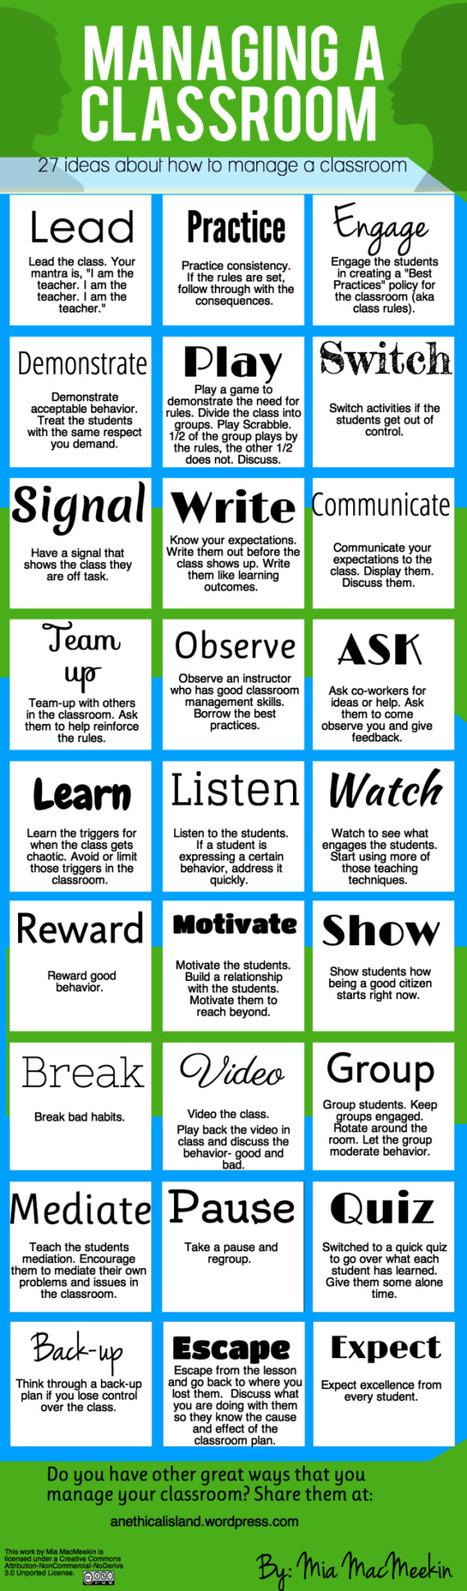 27 Tips For Effective Classroom Management - Edudemic | 21st century skills | Scoop.it